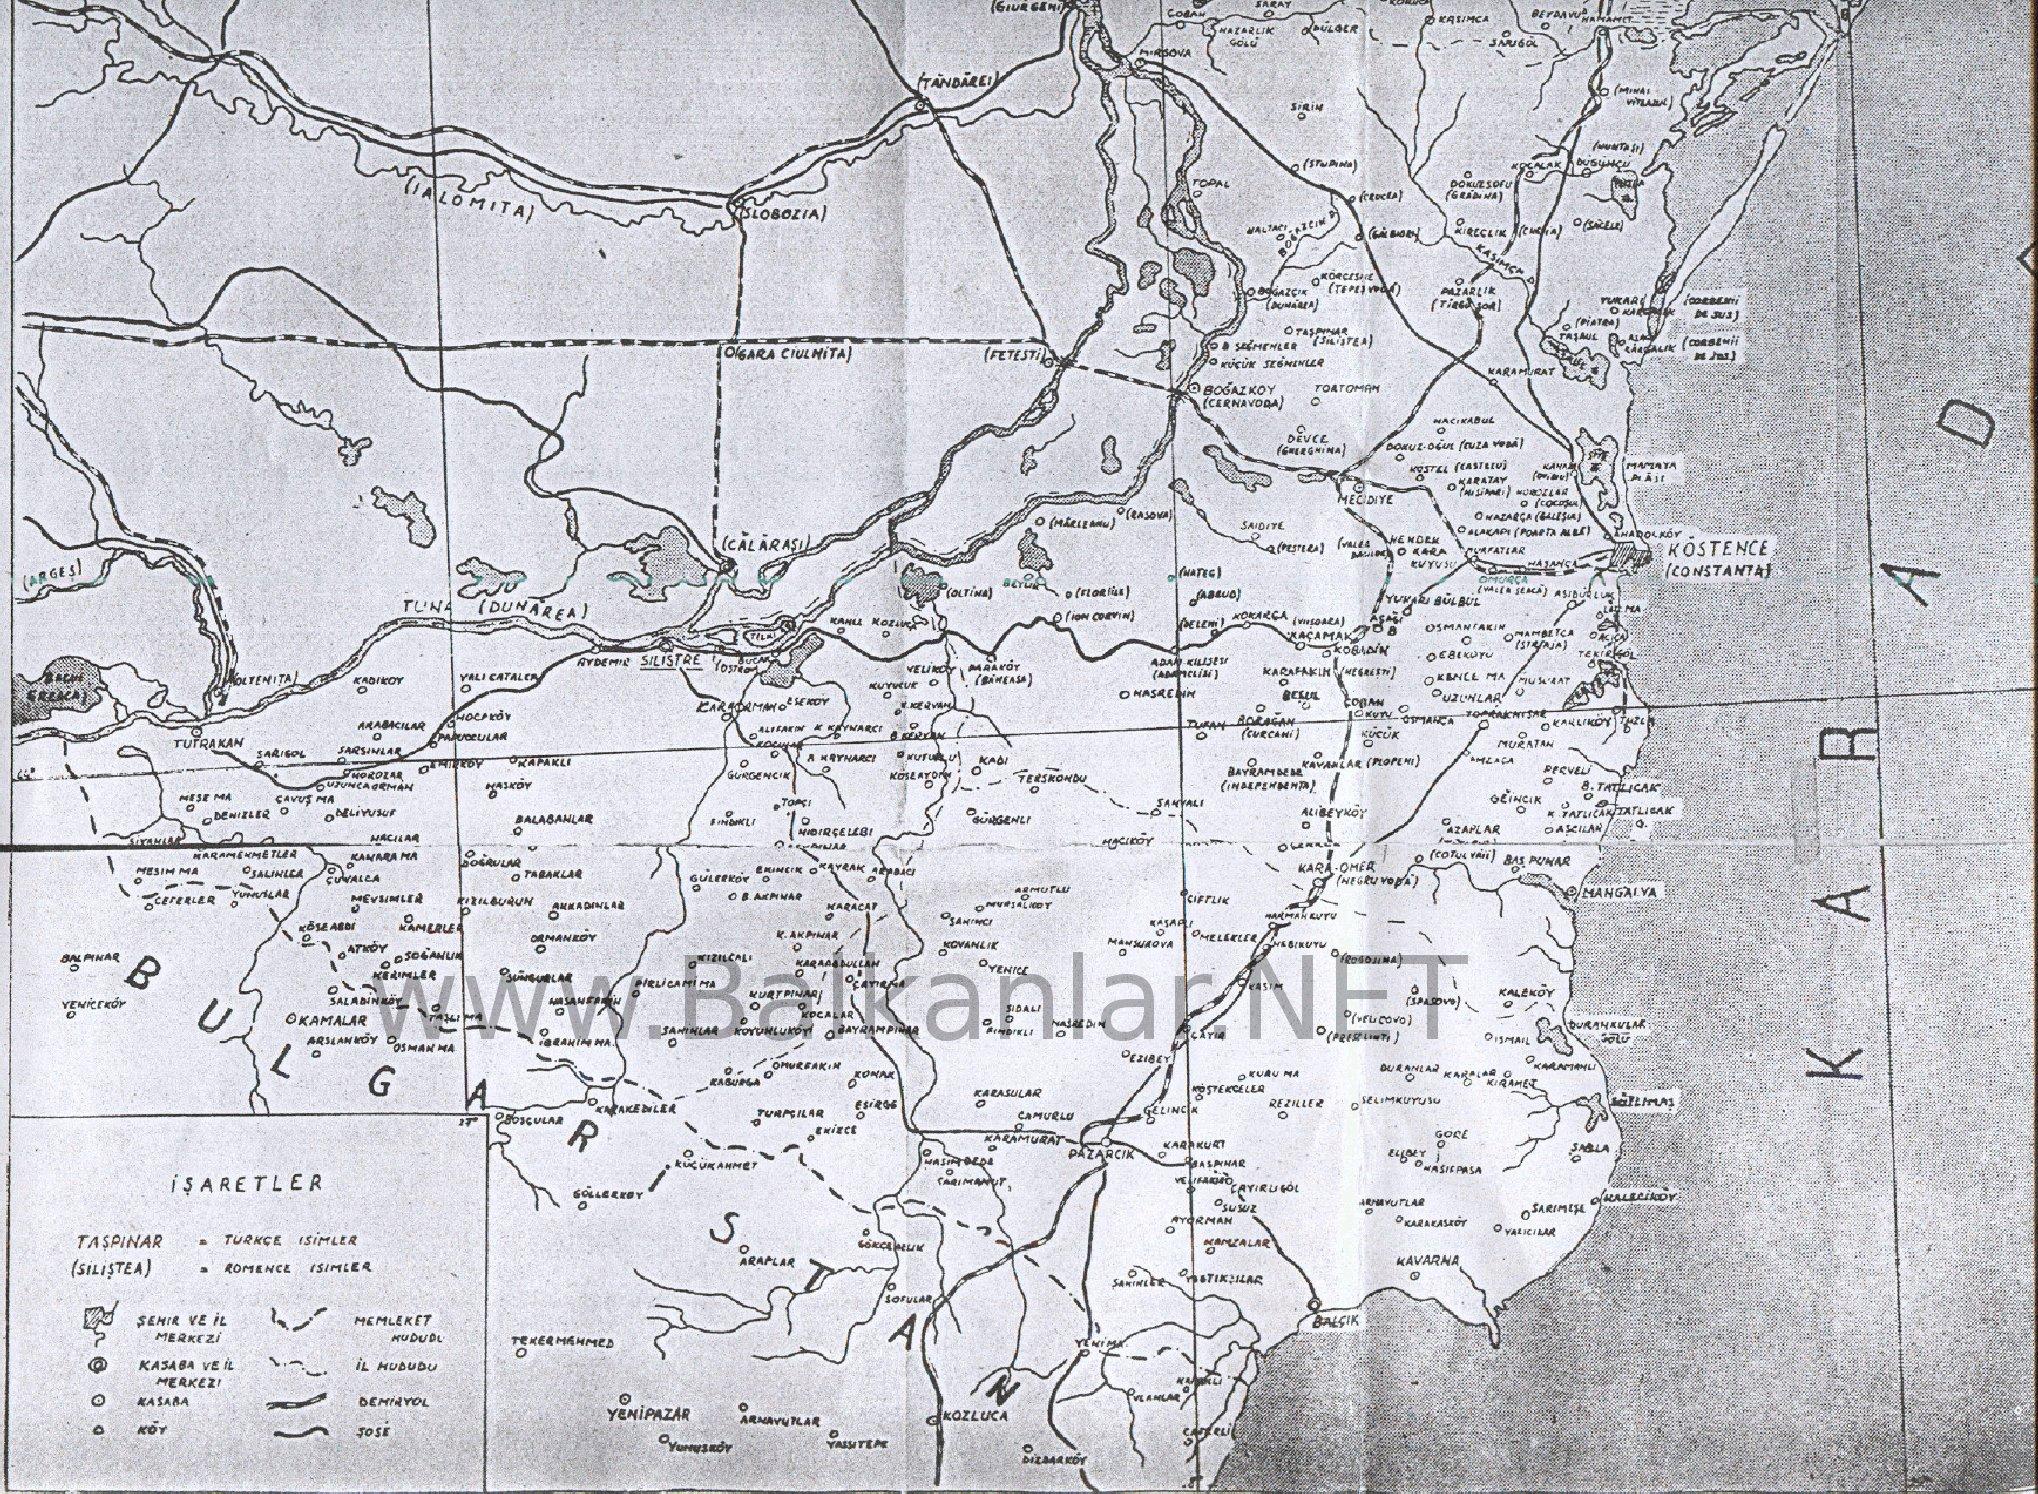 http://www.balkanlar.net/harita.jpg